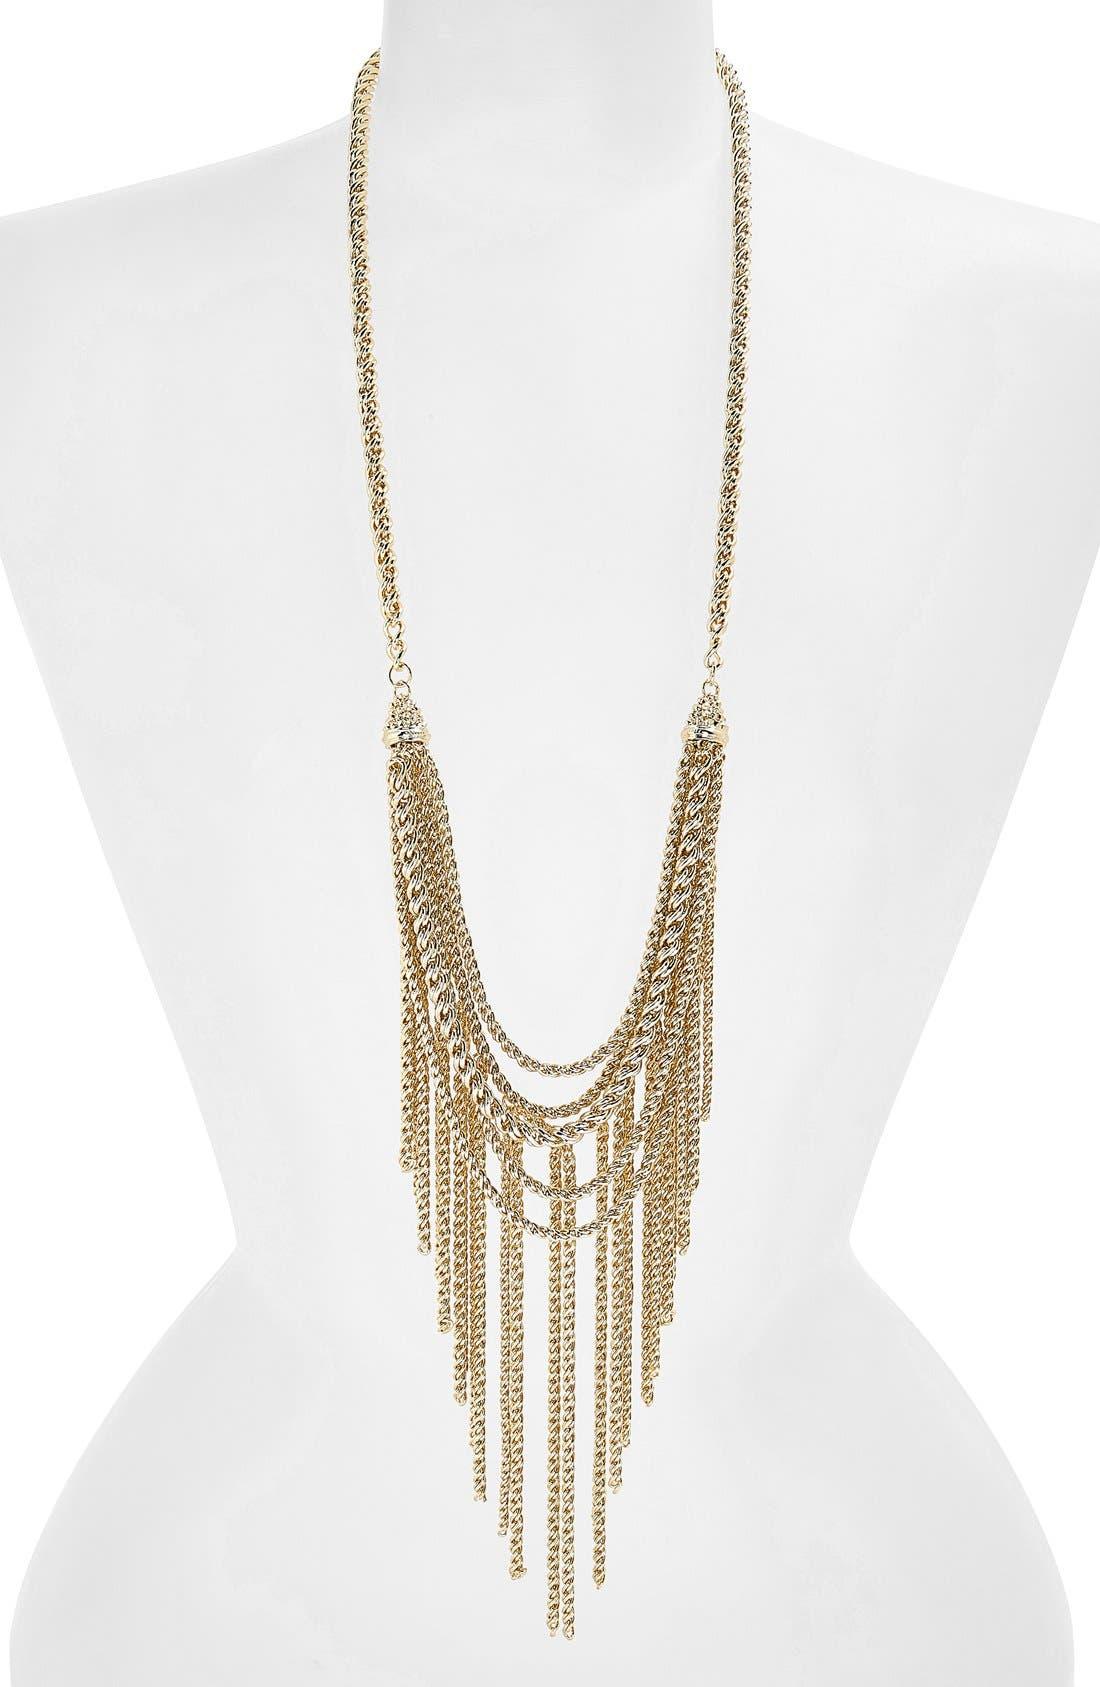 Main Image - Kendra Scott 'Landry' Long Chain Fringed Necklace